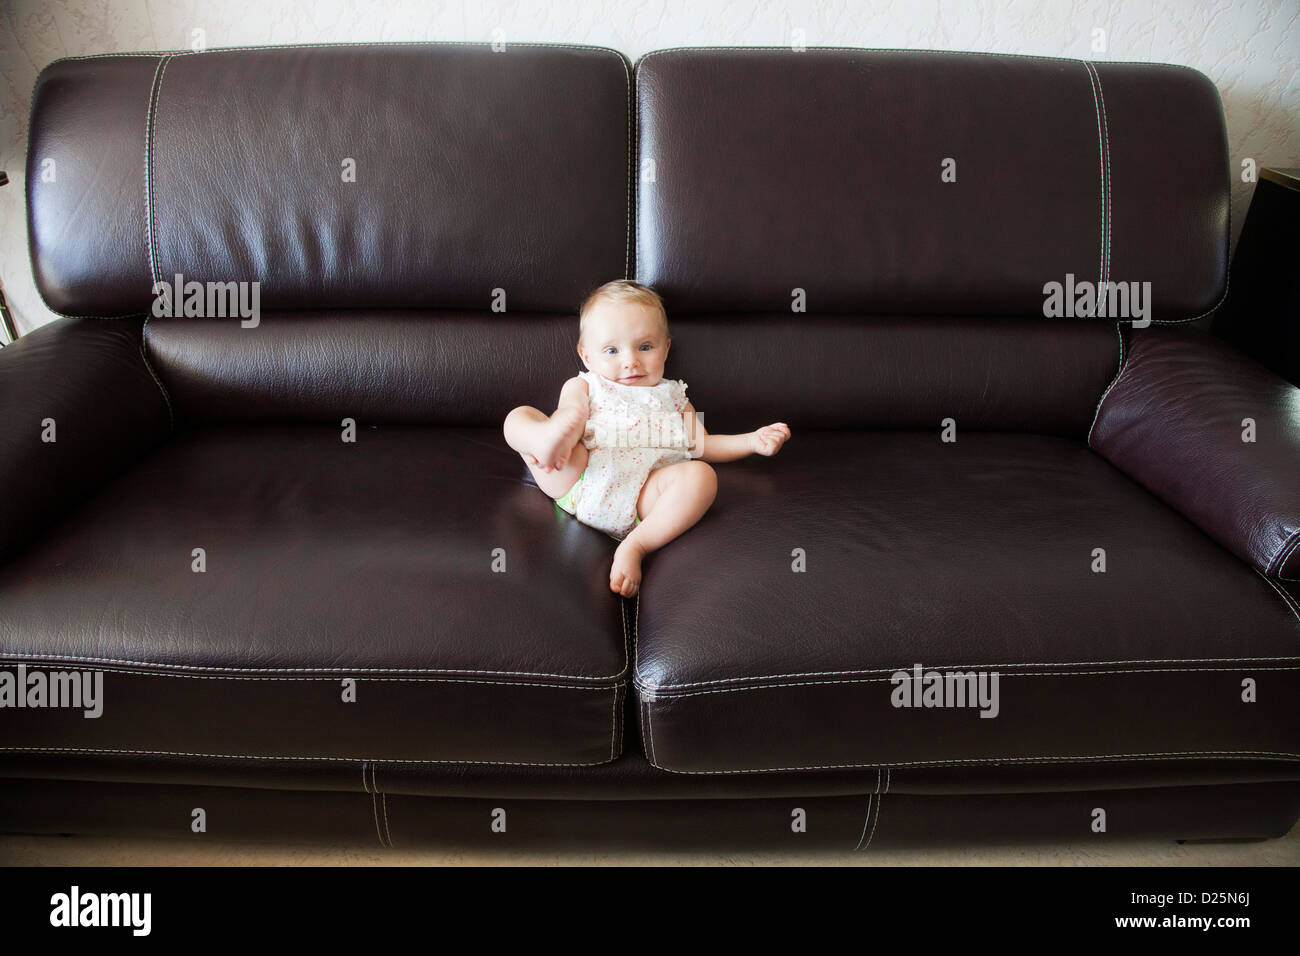 in voller Länge innen innen innen innen Interieur sitzen sitzen sitzen sitzt allein Lonesome Single 1 Individualität Stockbild